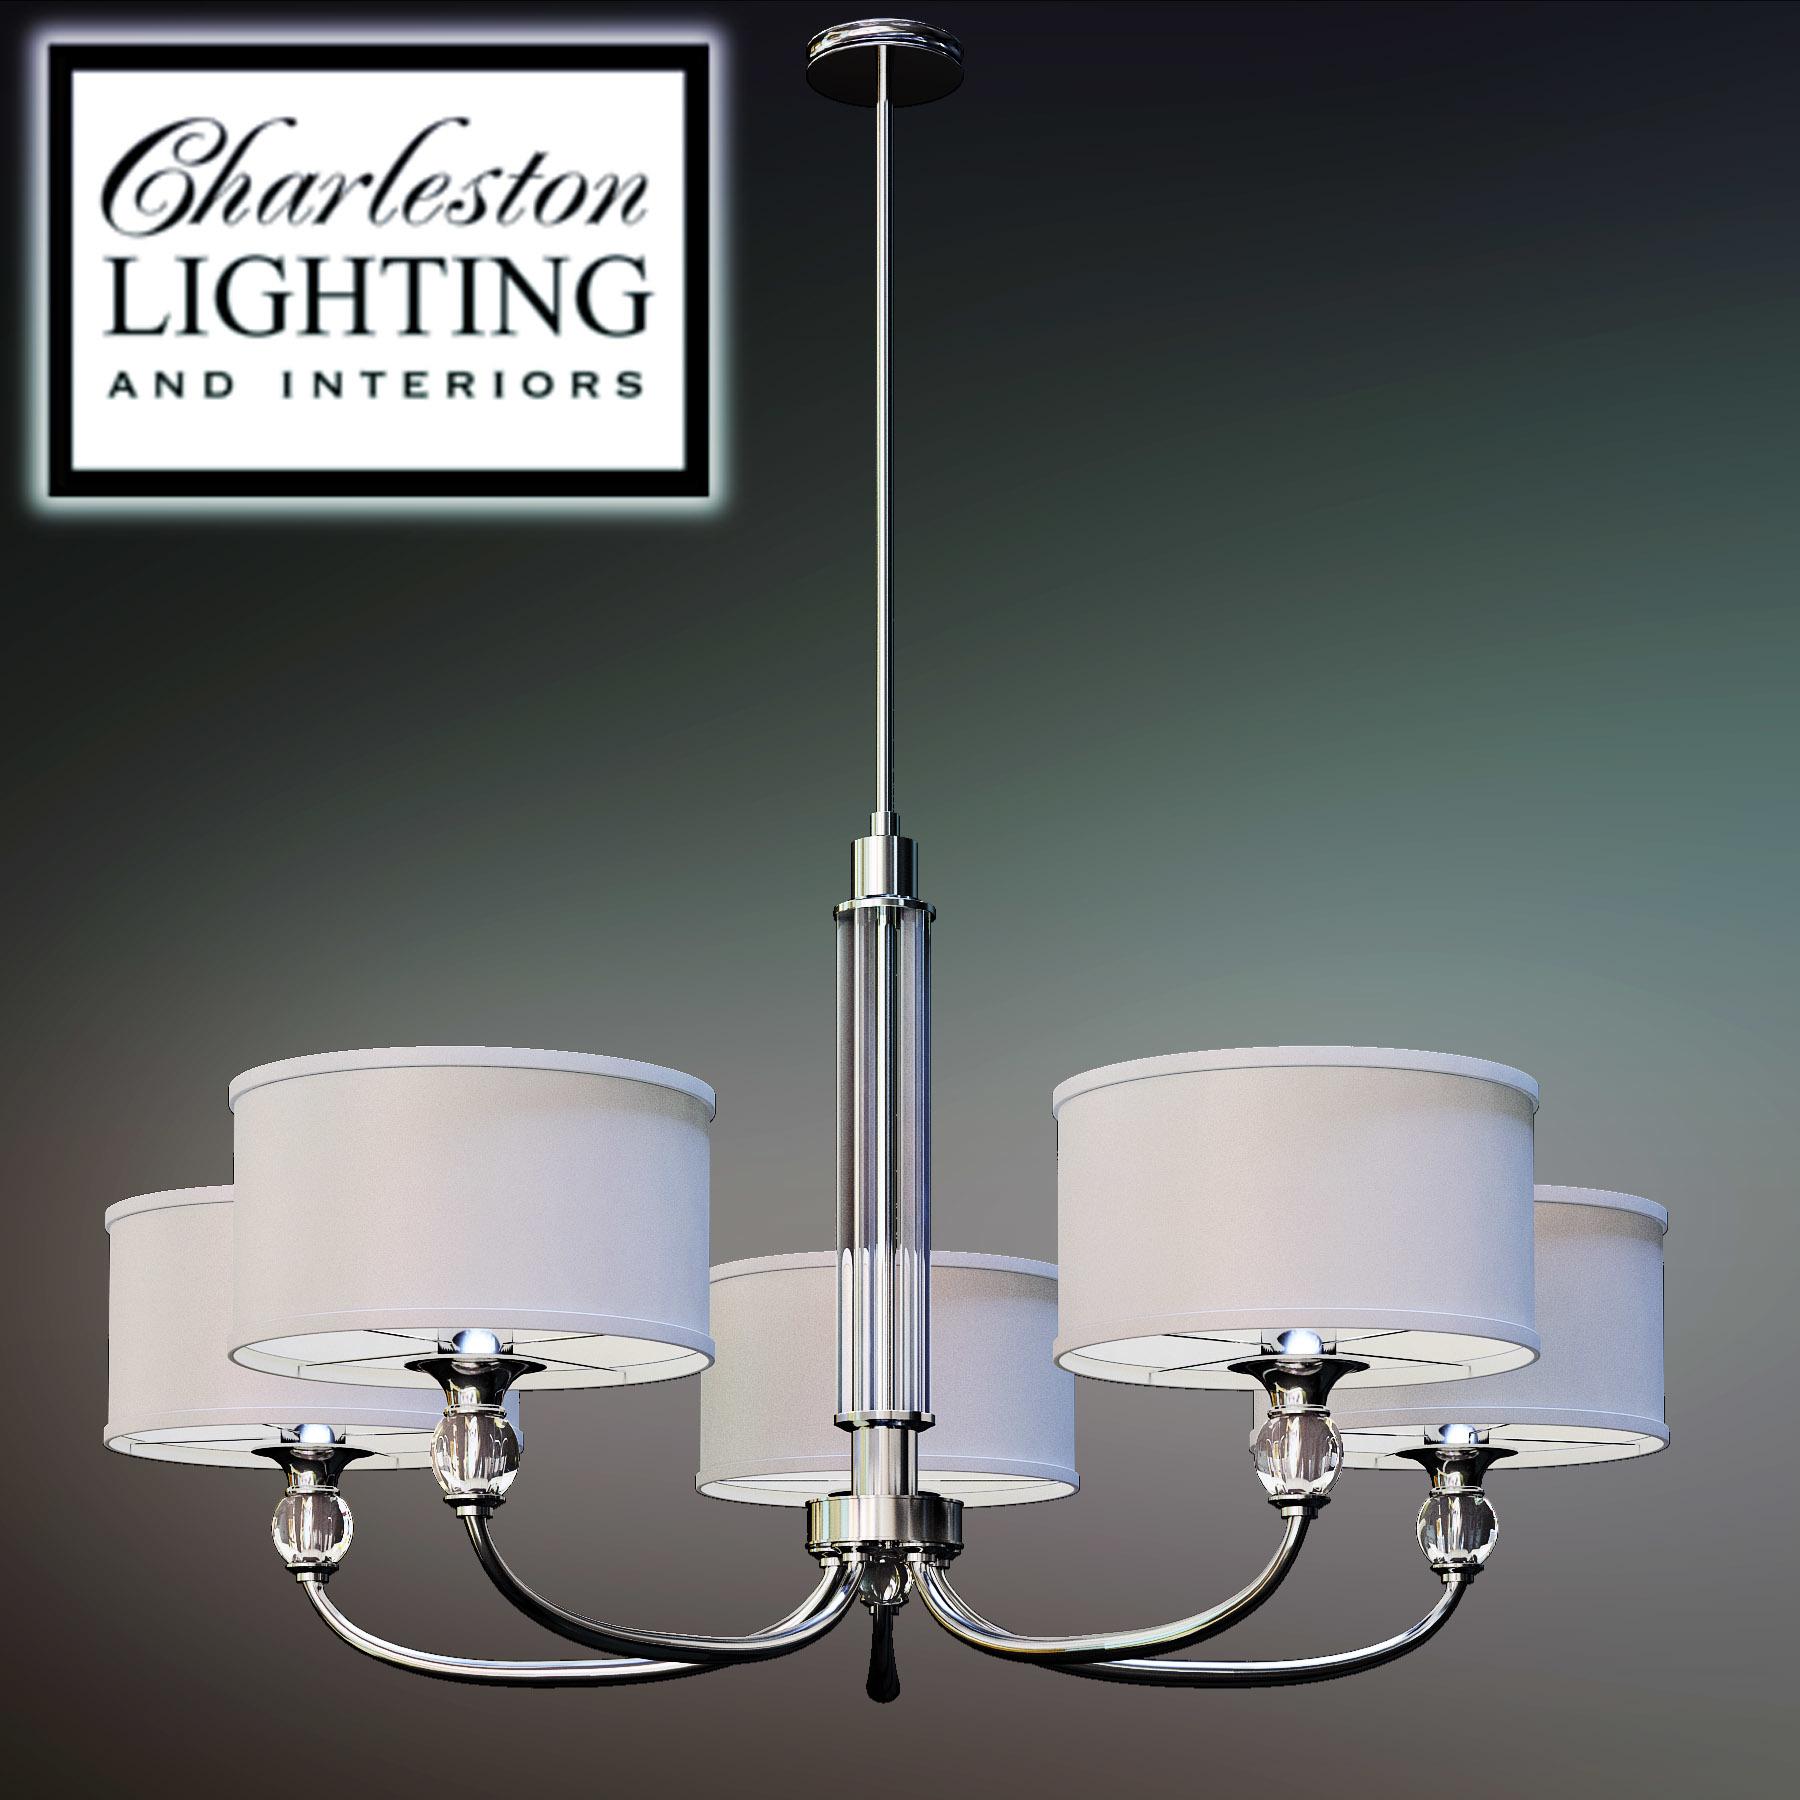 Chandelier Charleston Lighting And Interiors 000754